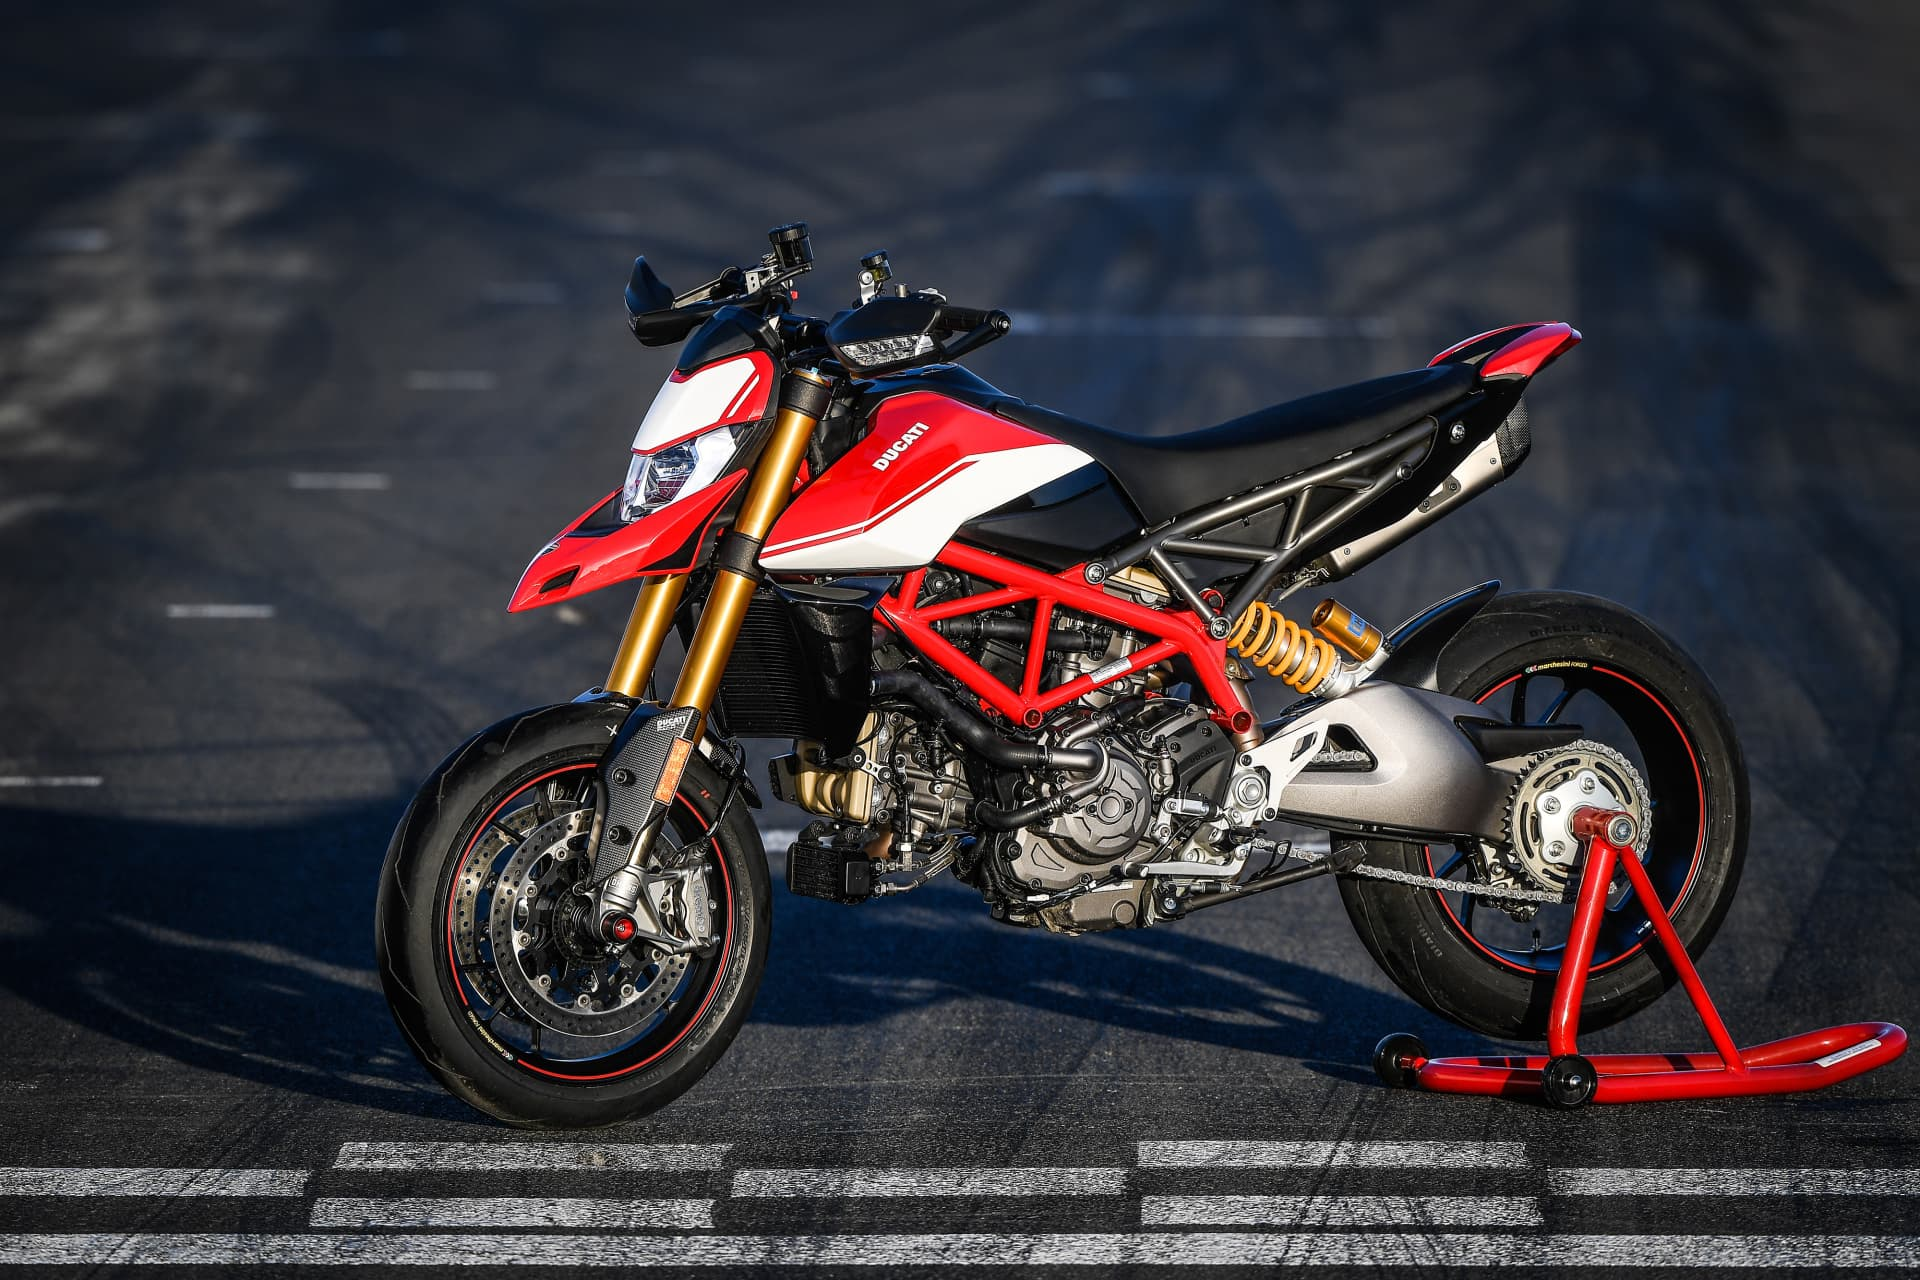 Ducati Hypermotard 950 Sp Static 12 Uc70313 Mid